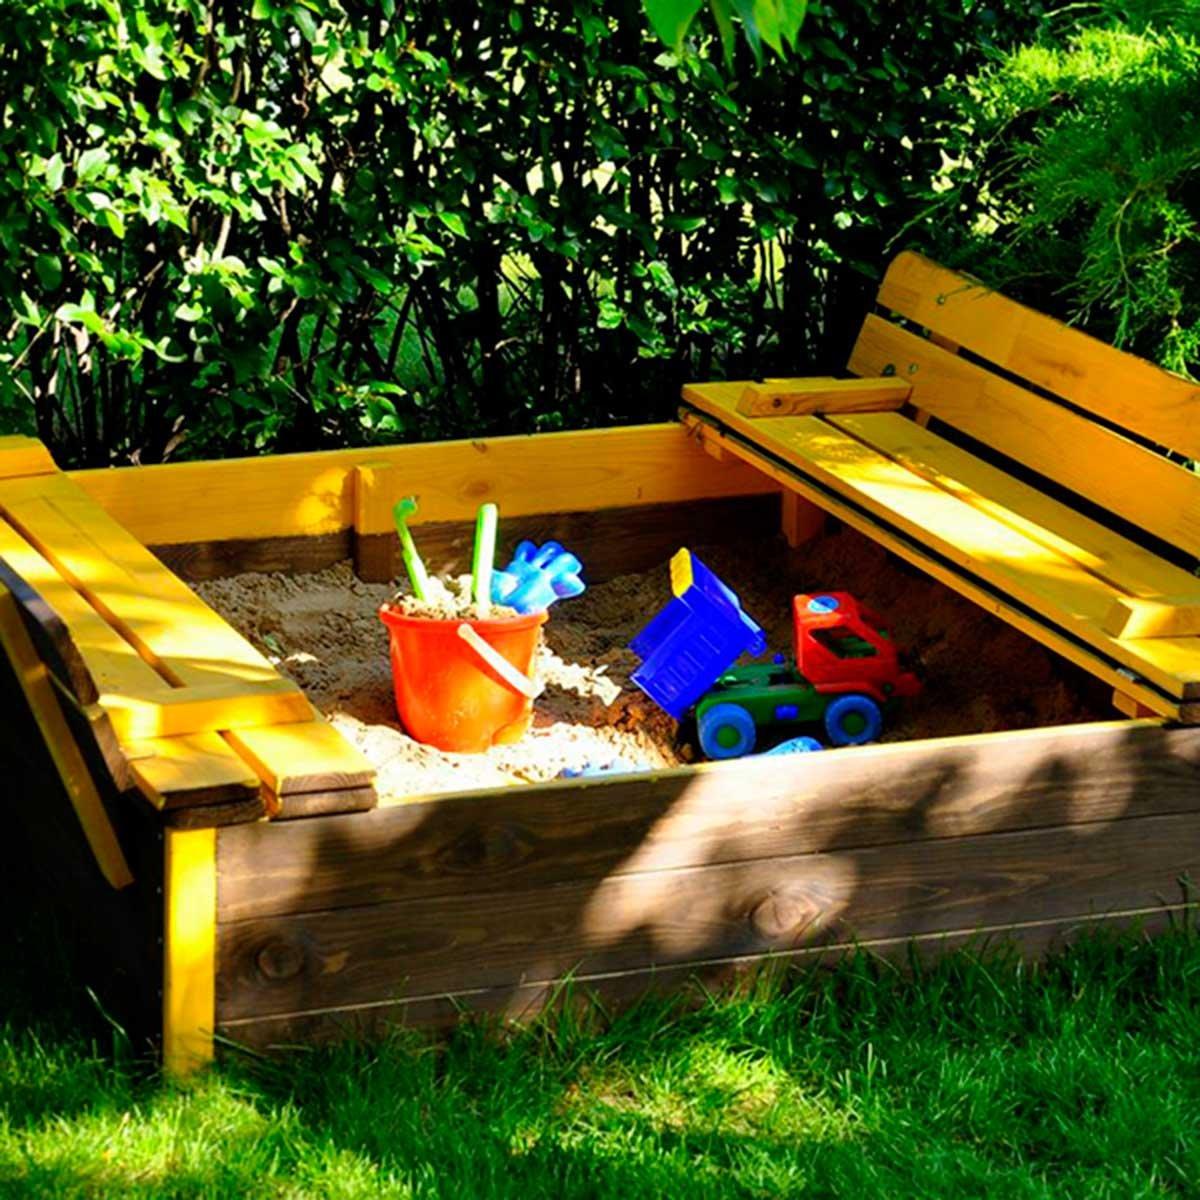 KT12812 Outdoor Toys Arenero de madera infantil